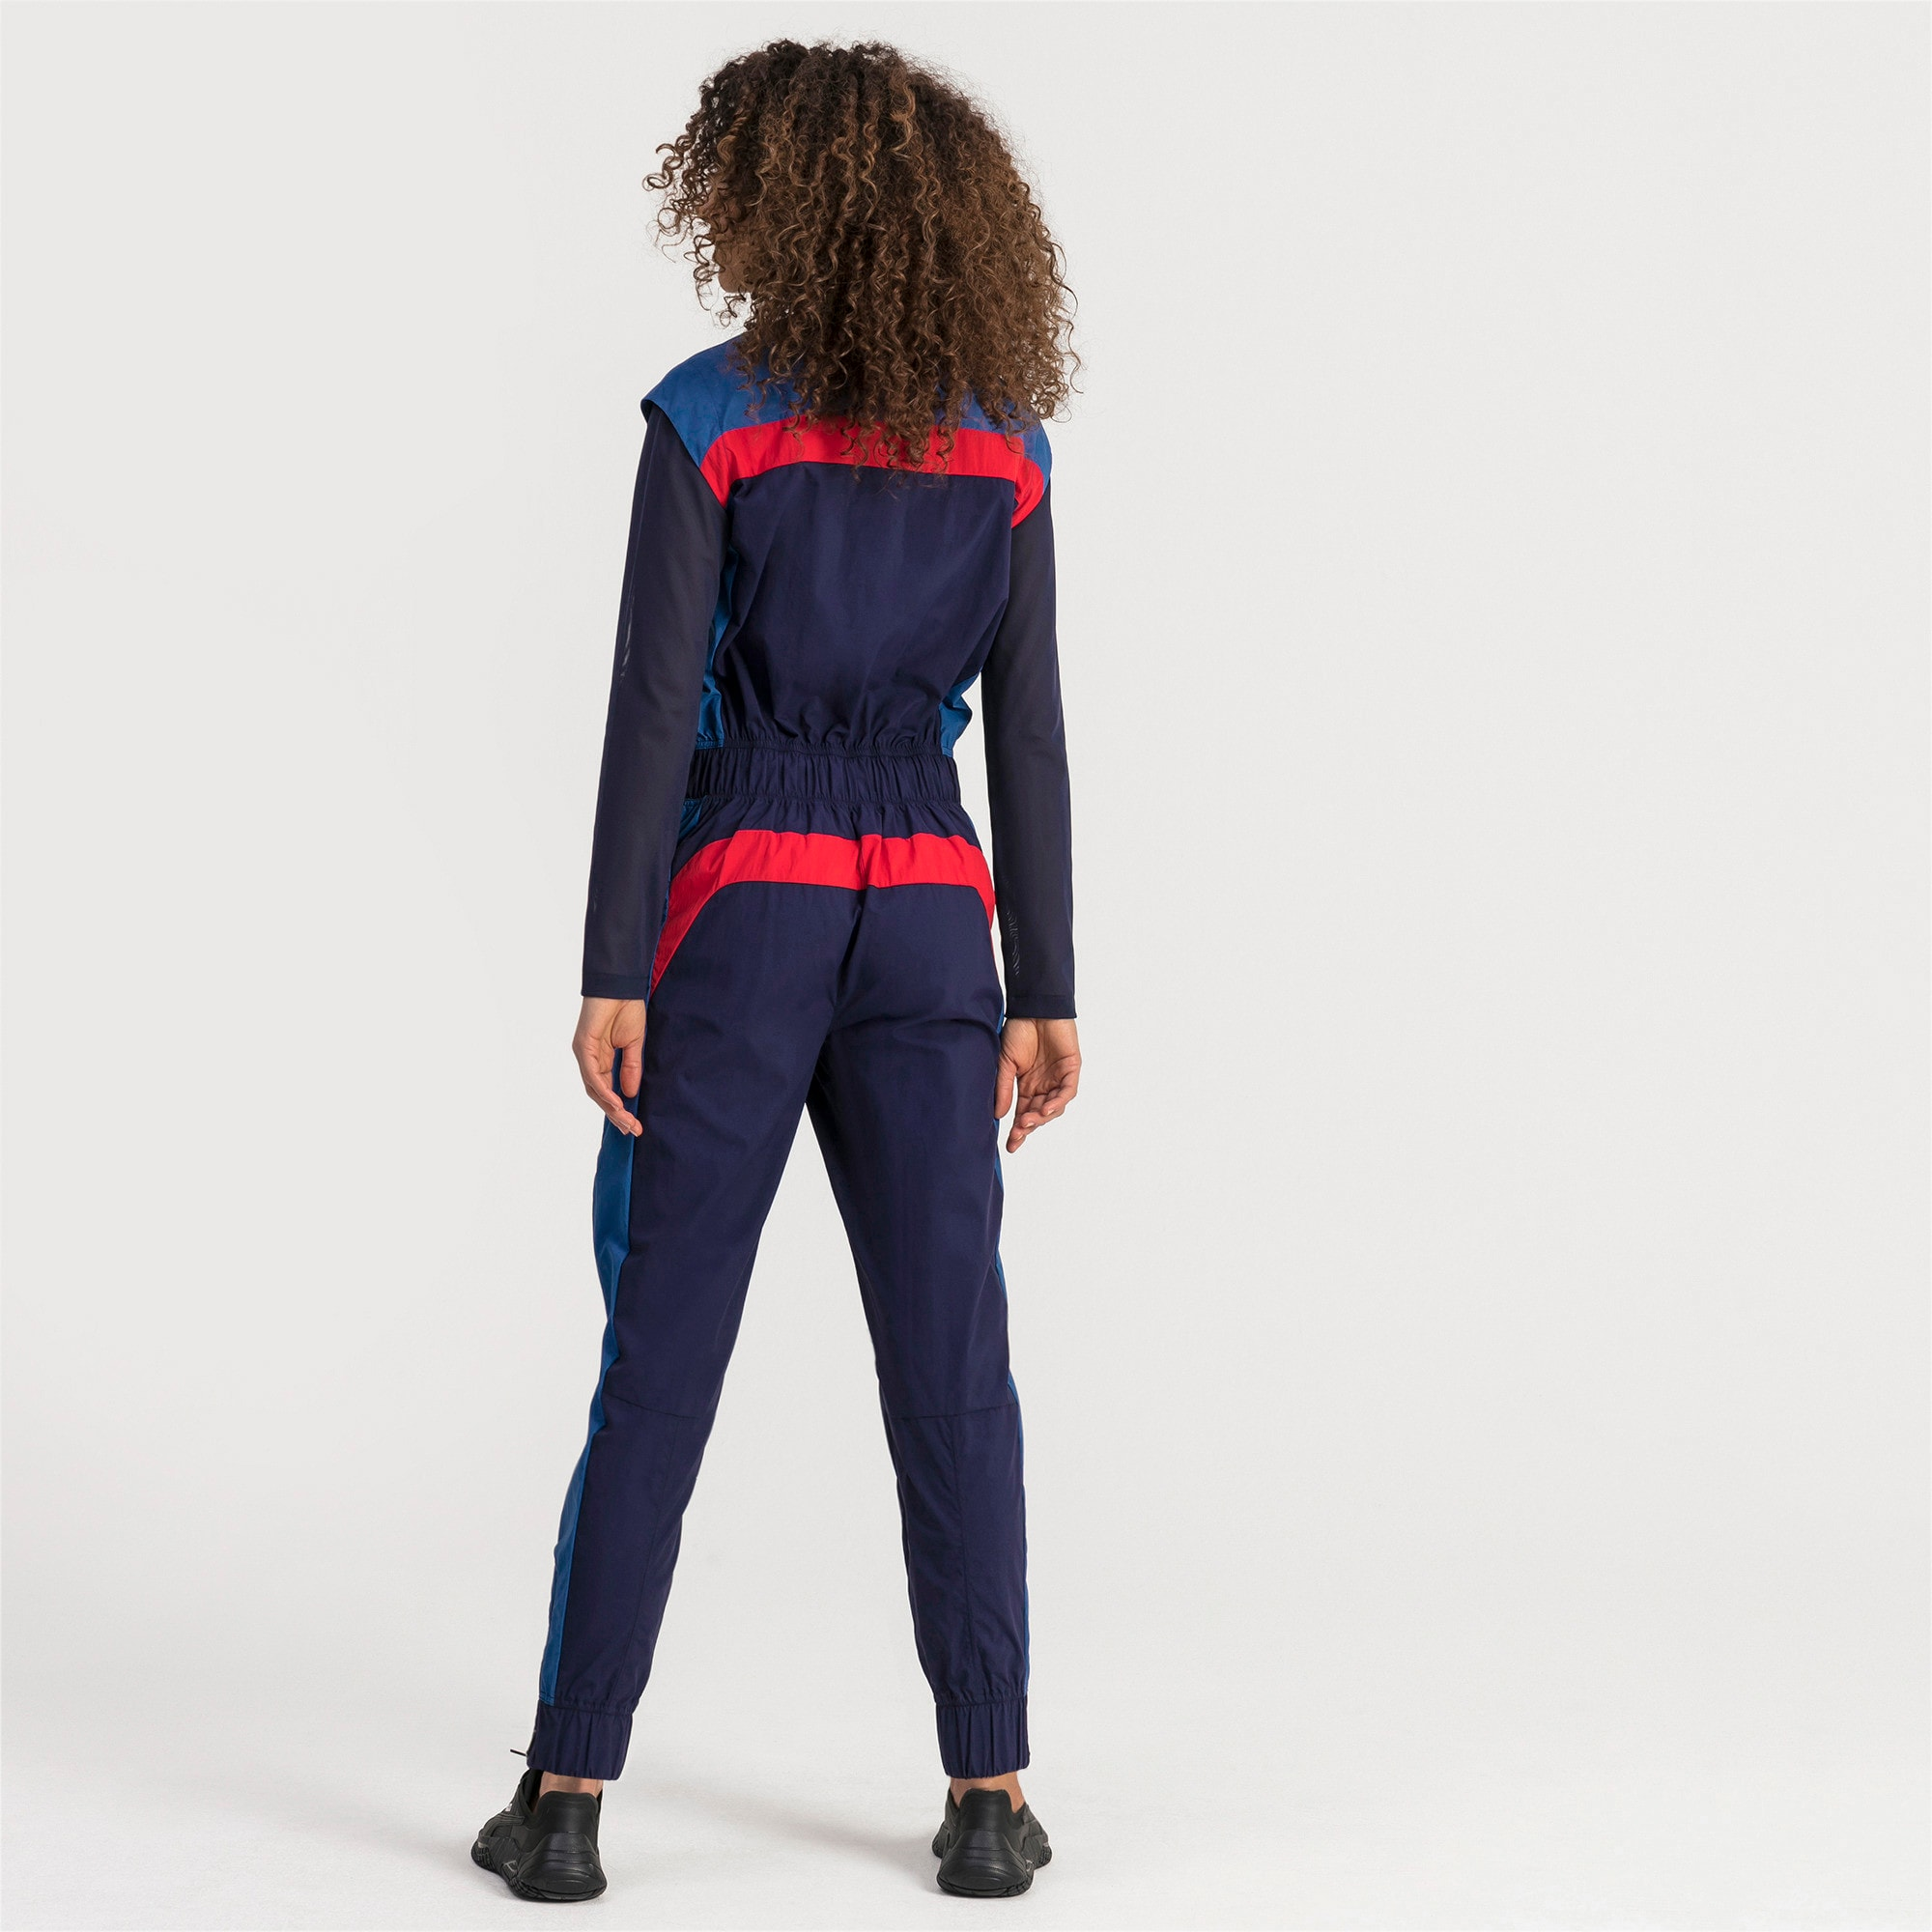 Thumbnail 2 of Ferrari Street Damen Jumpsuit, Galaxy Blue, medium